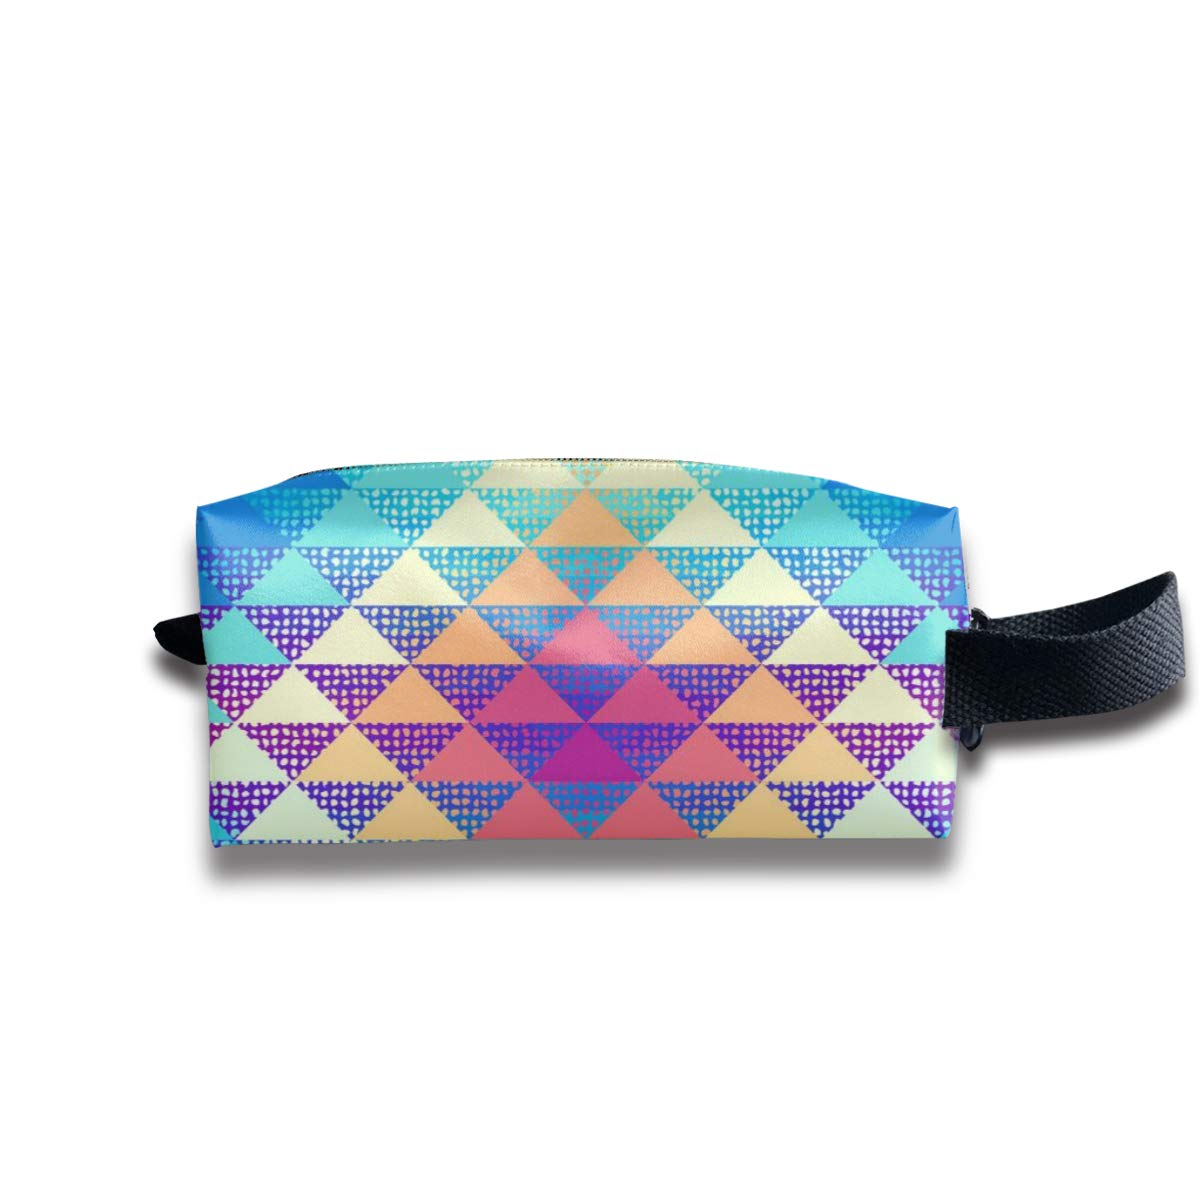 A Triangles_476 Canvas Makeup Bag Pouch Purse Handbag Organizer with Zipper